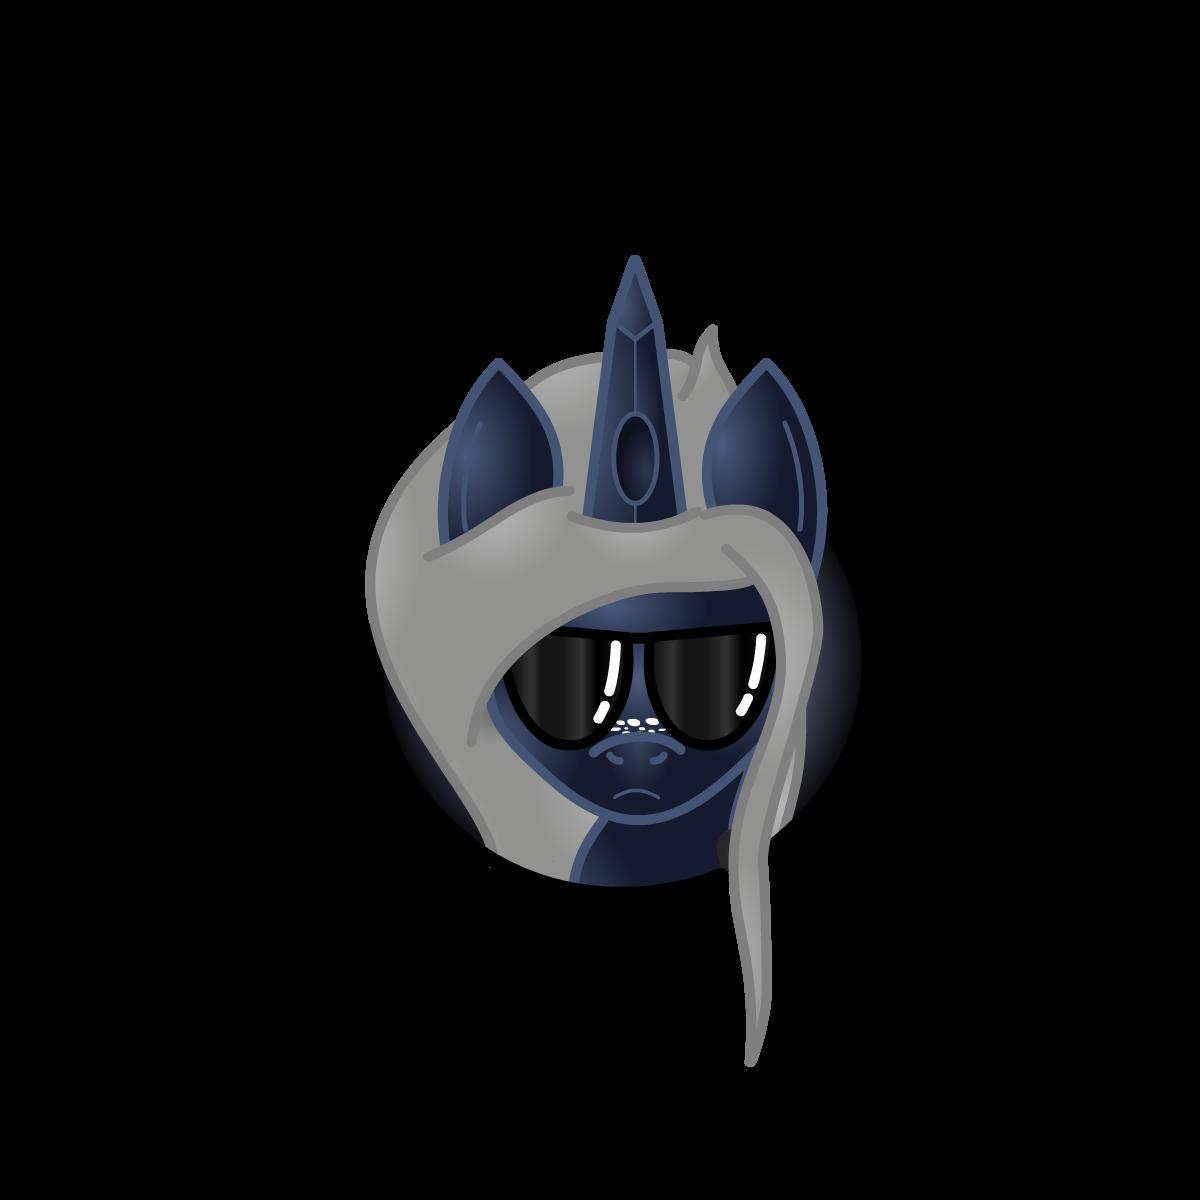 Silverwind Icon 3 by Lakword